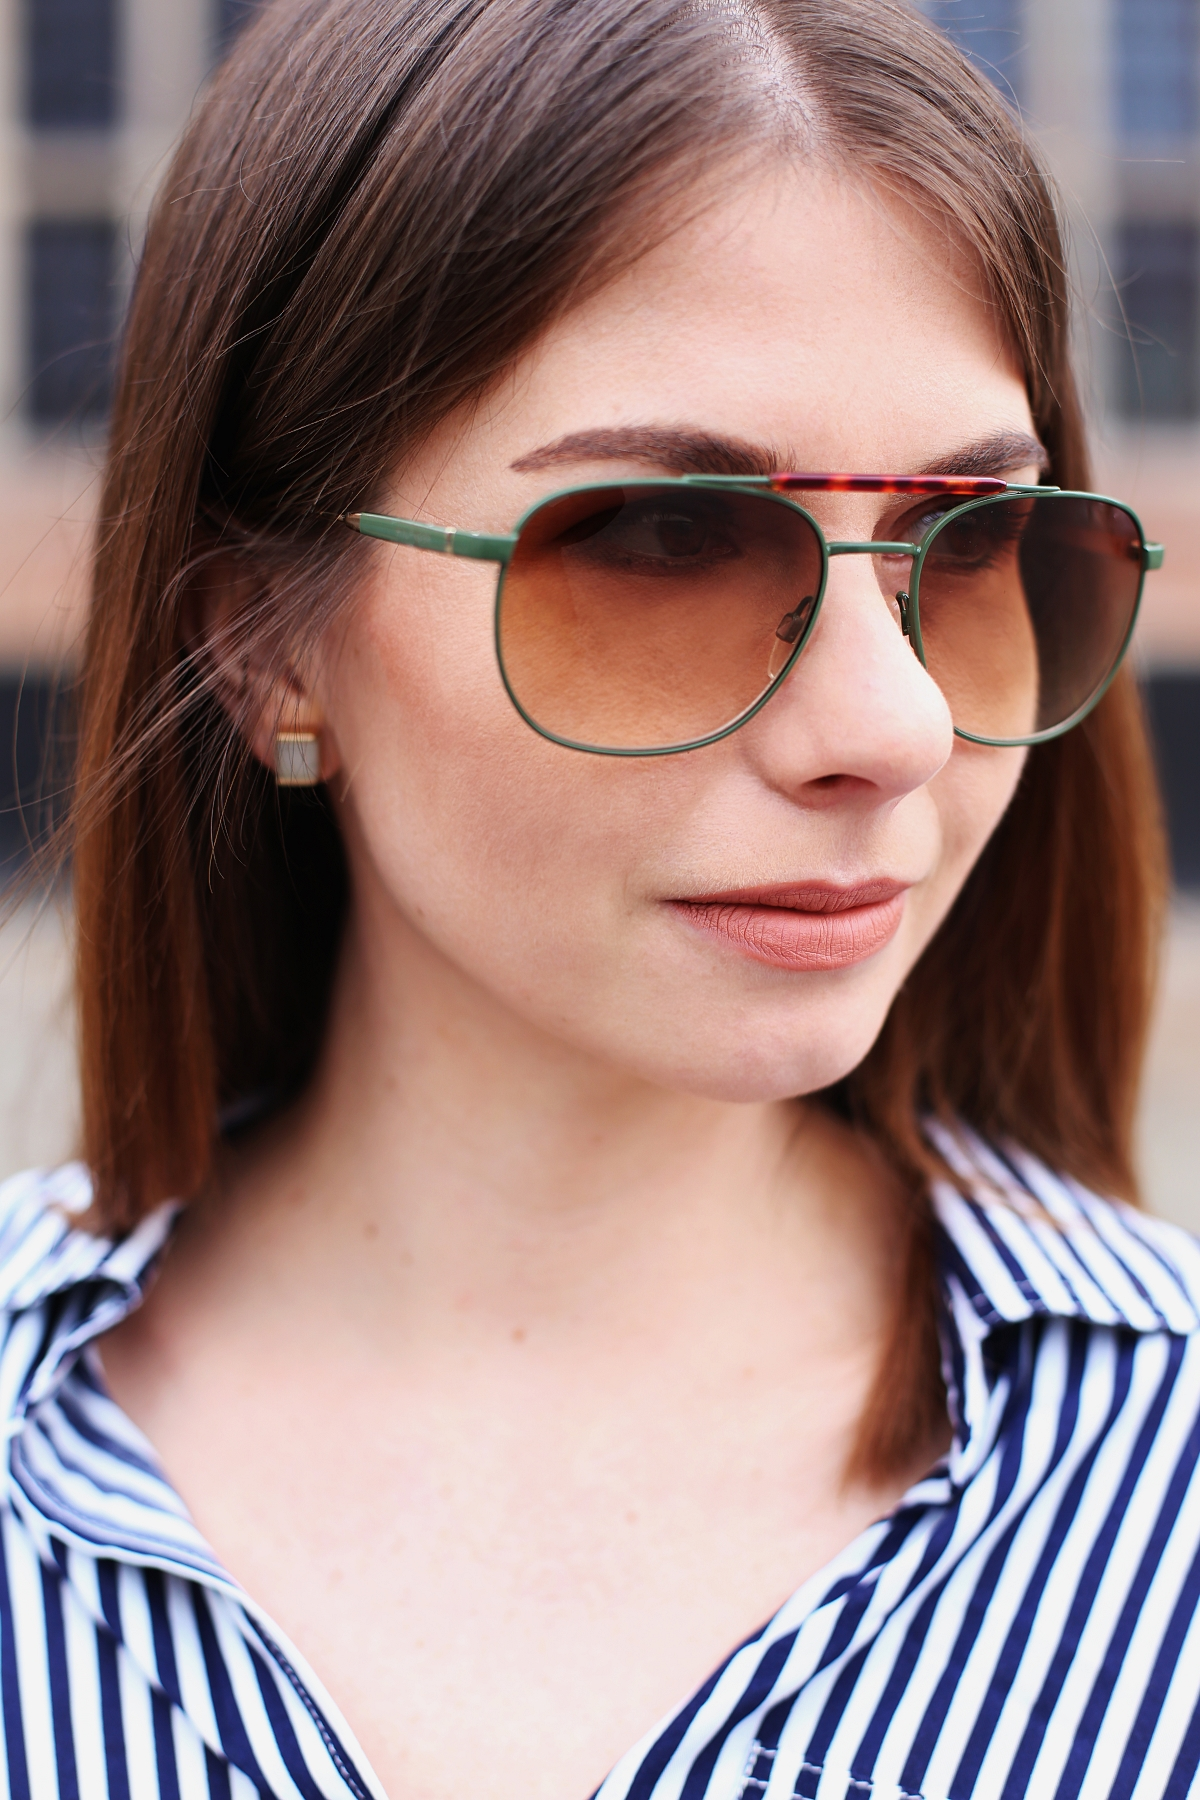 Okulary Tommy Hilfiger & pasiata koszula